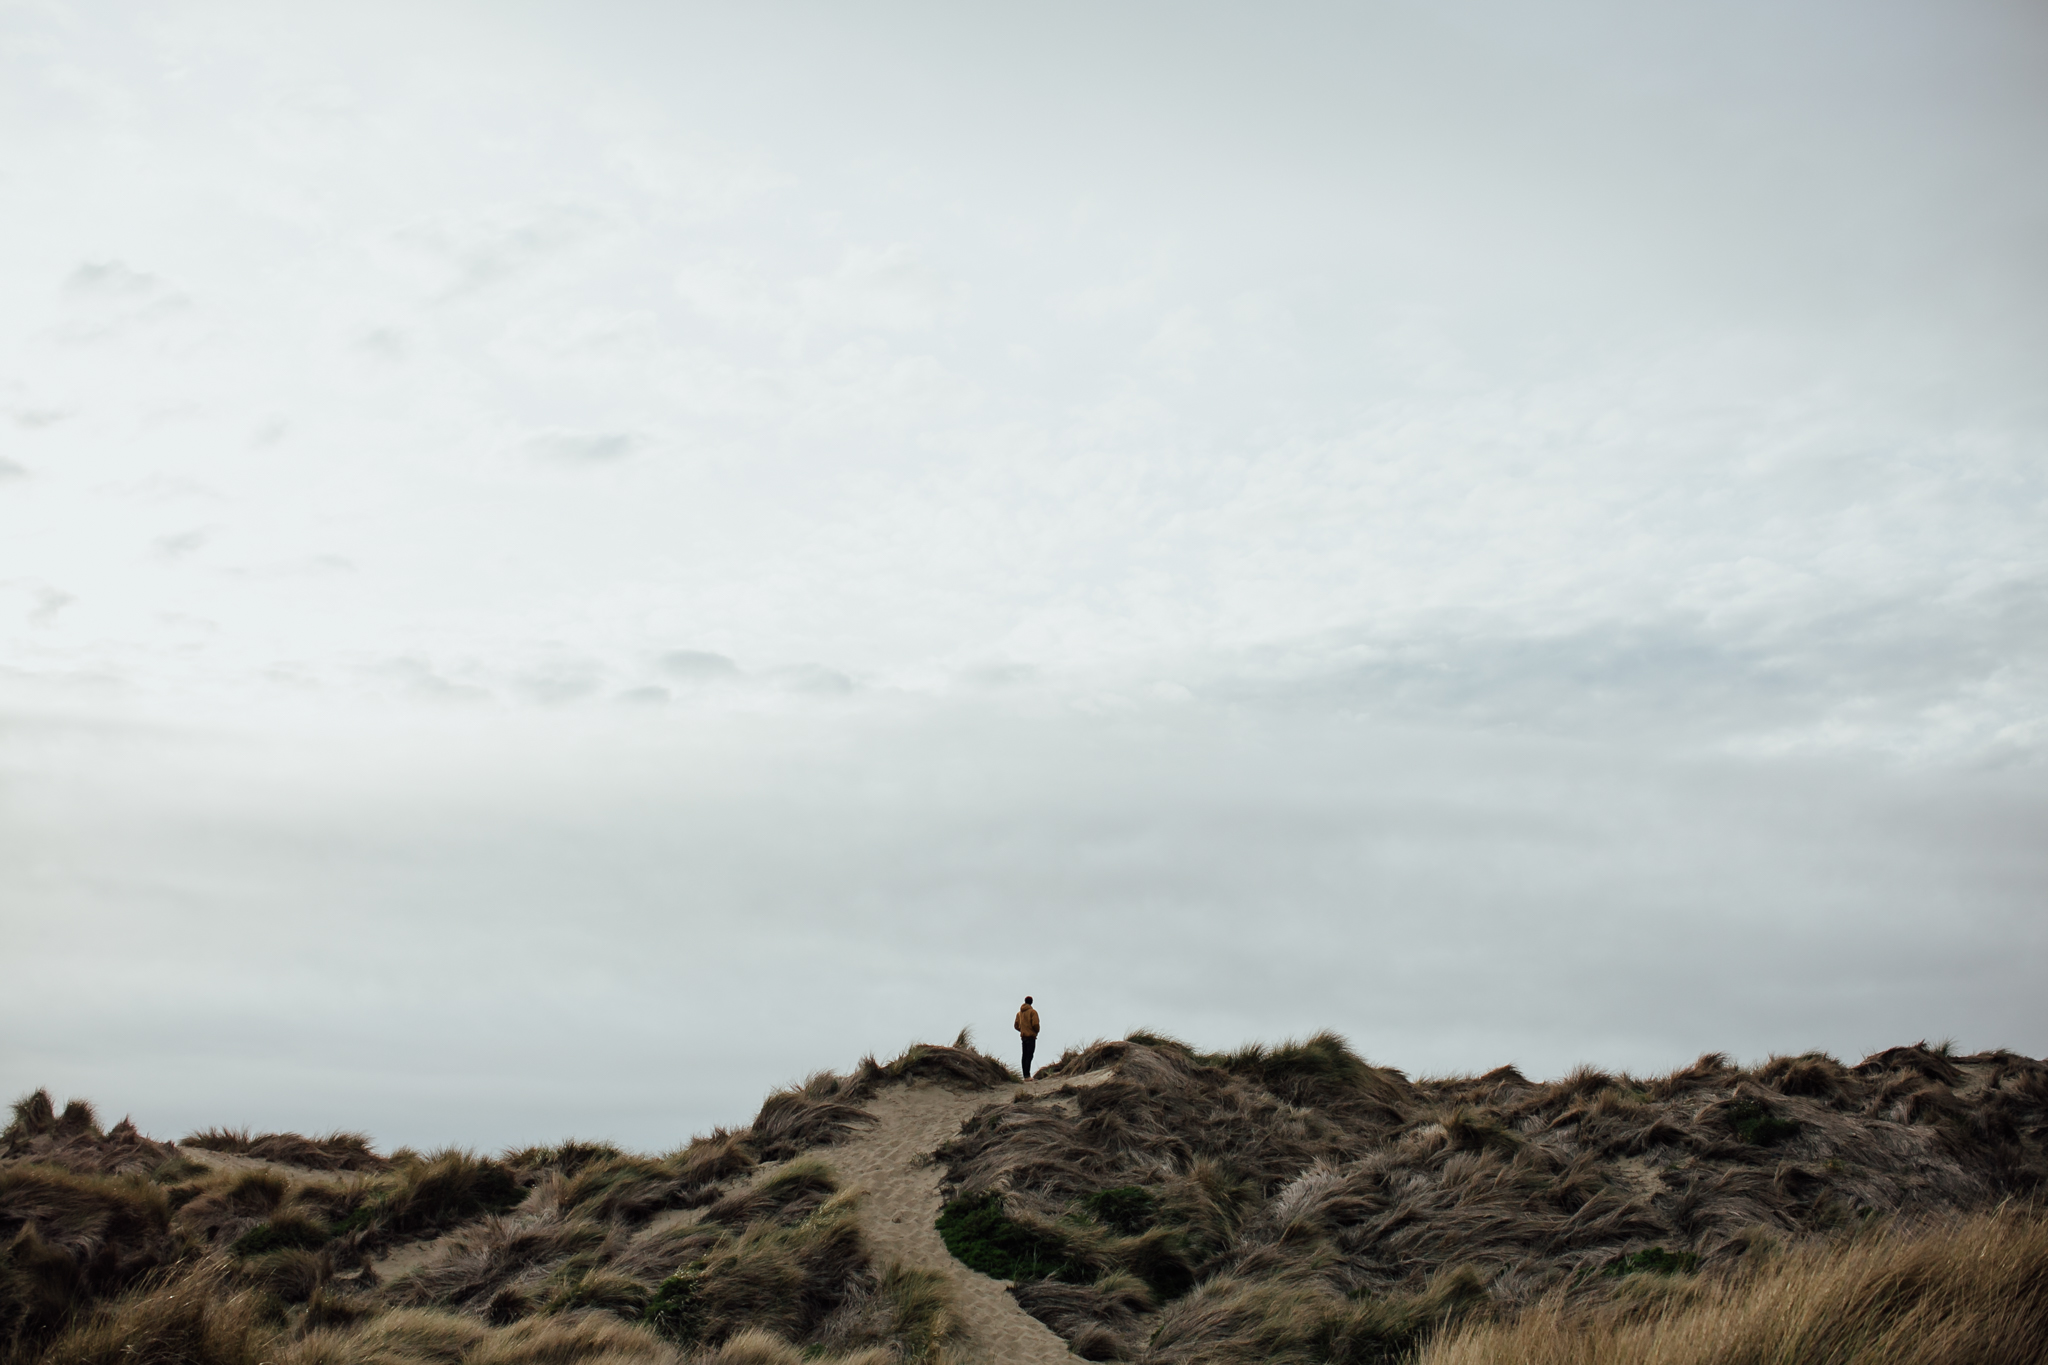 dillonbeach-california-marbleryephotography-015.jpg